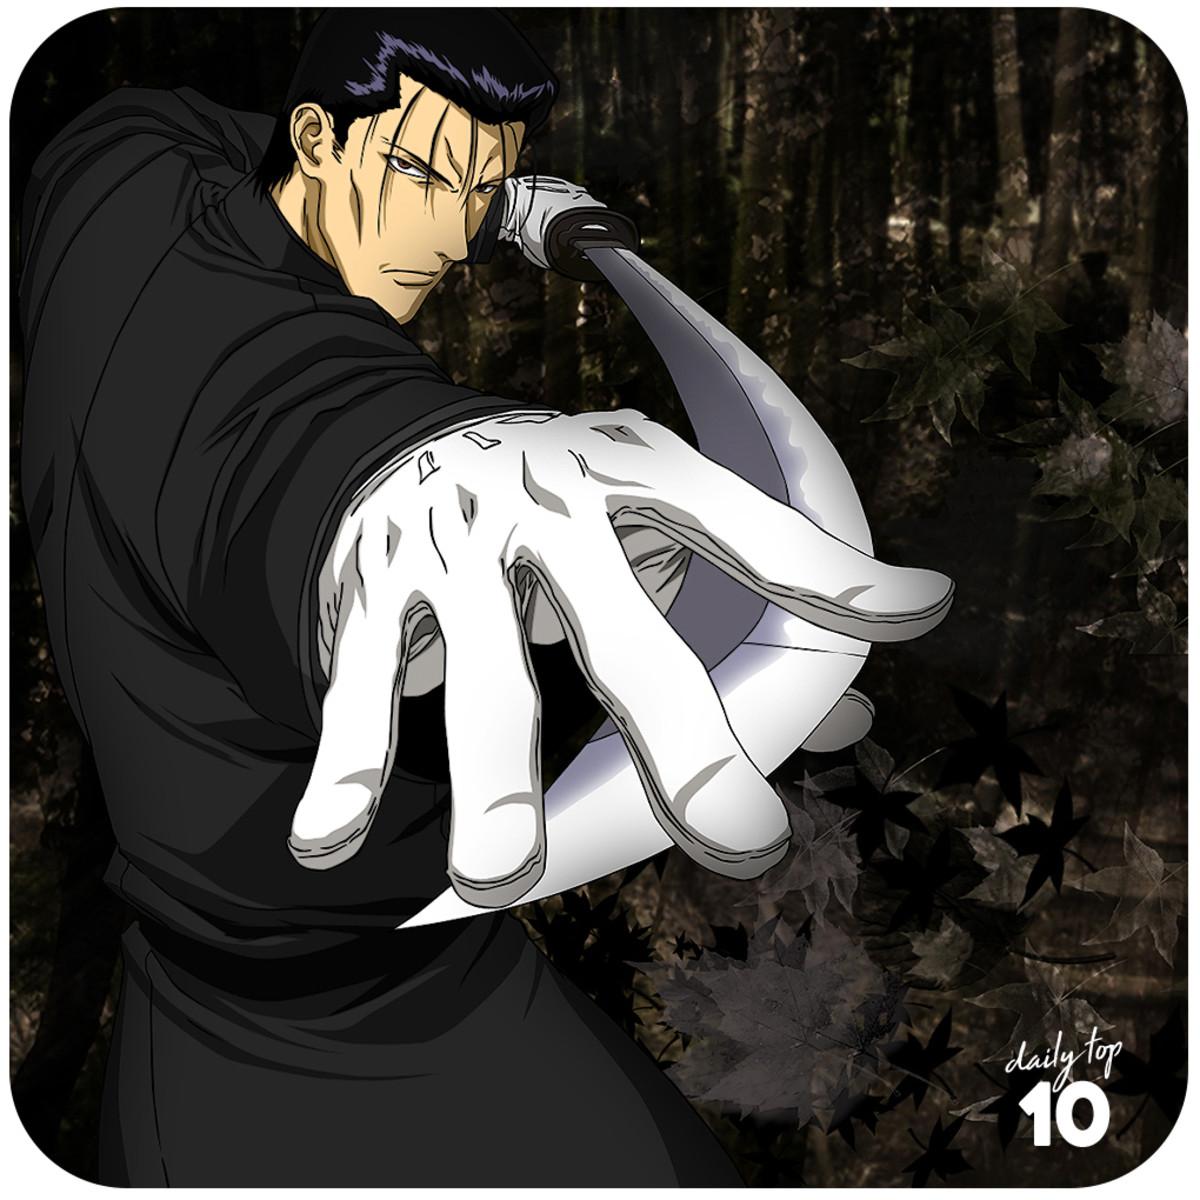 Saito Hajime pointing his sword